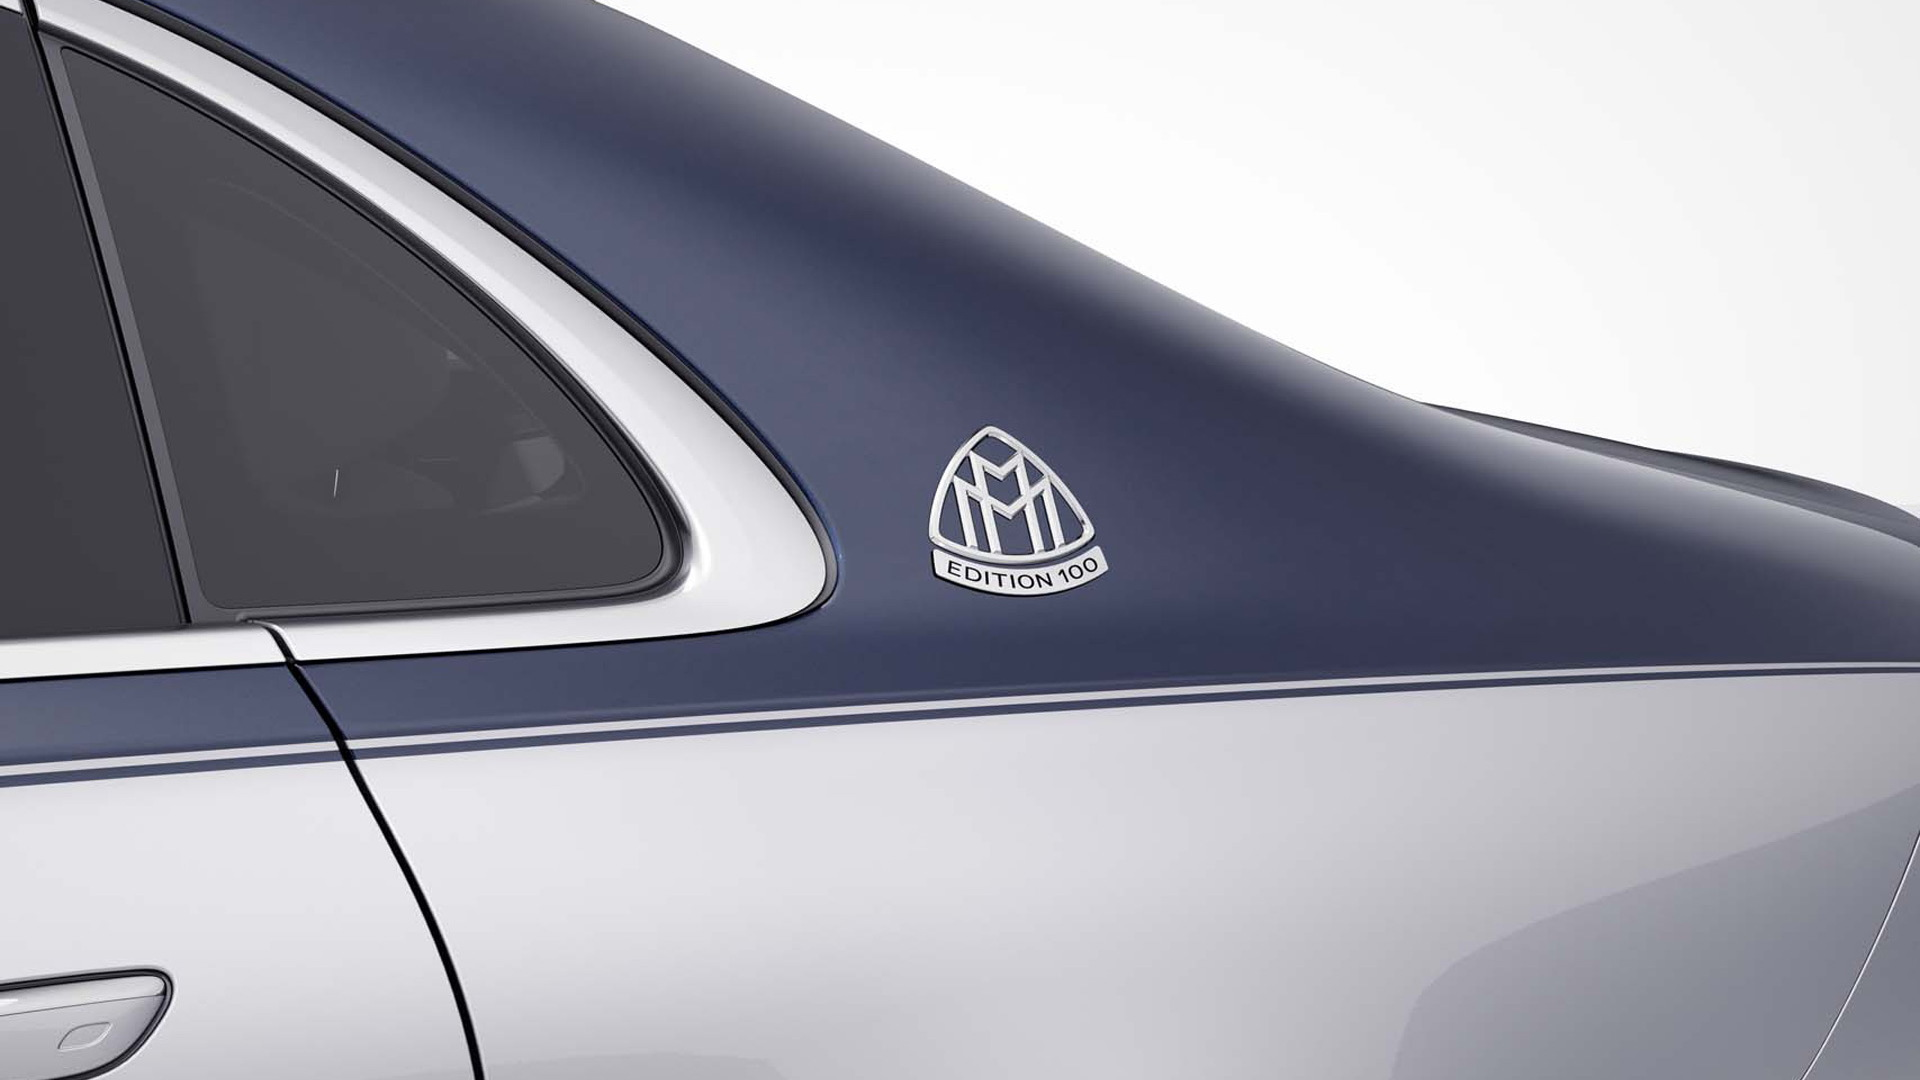 2022 Mercedes-Benz Maybach S680 Edition 100